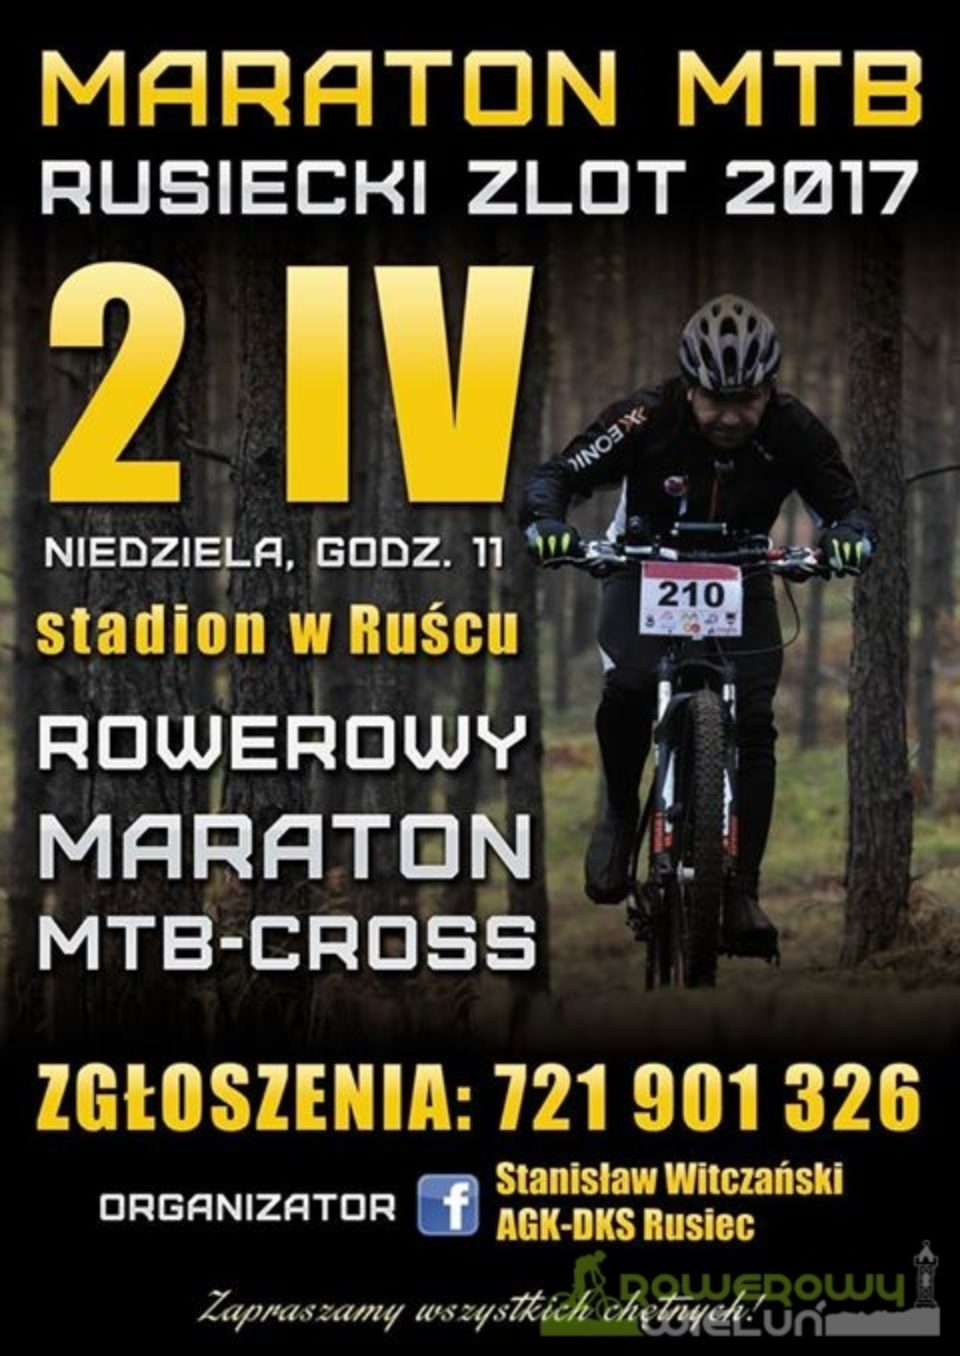 http://rowerowywielun.pl/wp-content/uploads/2017/03/plakat-rusiec-960x1356_c.jpg